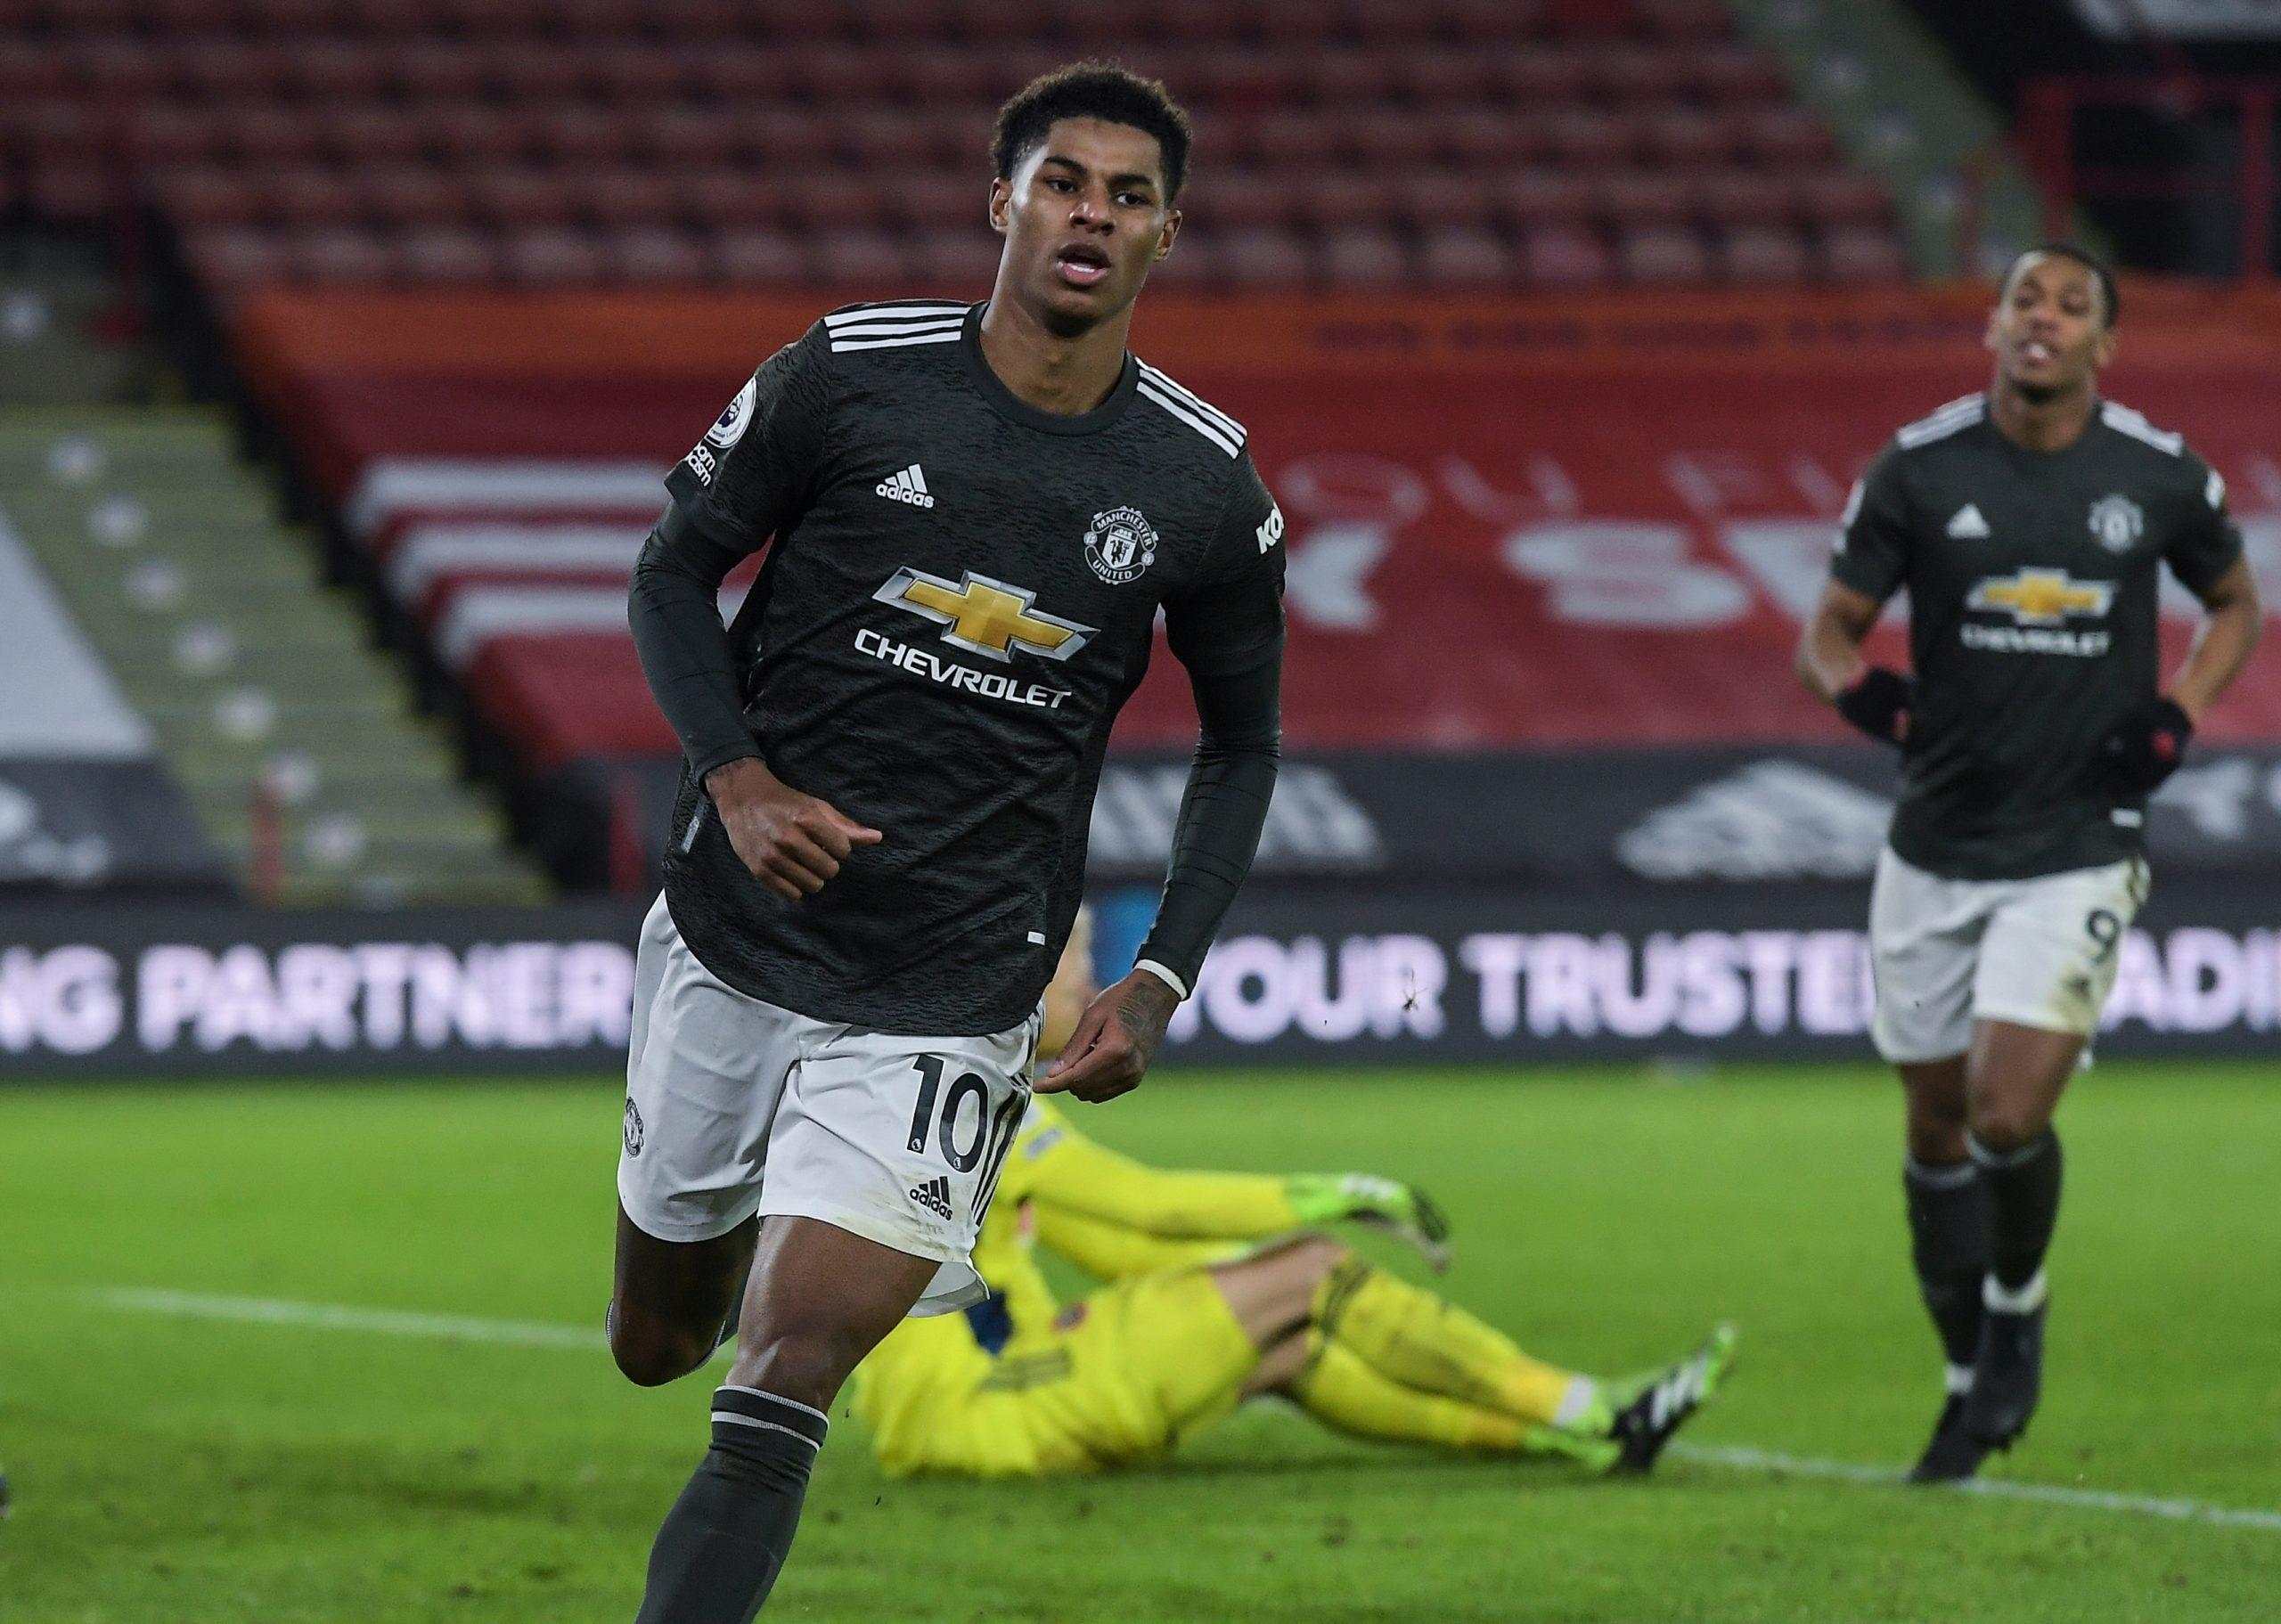 Marcus Rashford scored a brace as Manchester United defeated Sheffield United